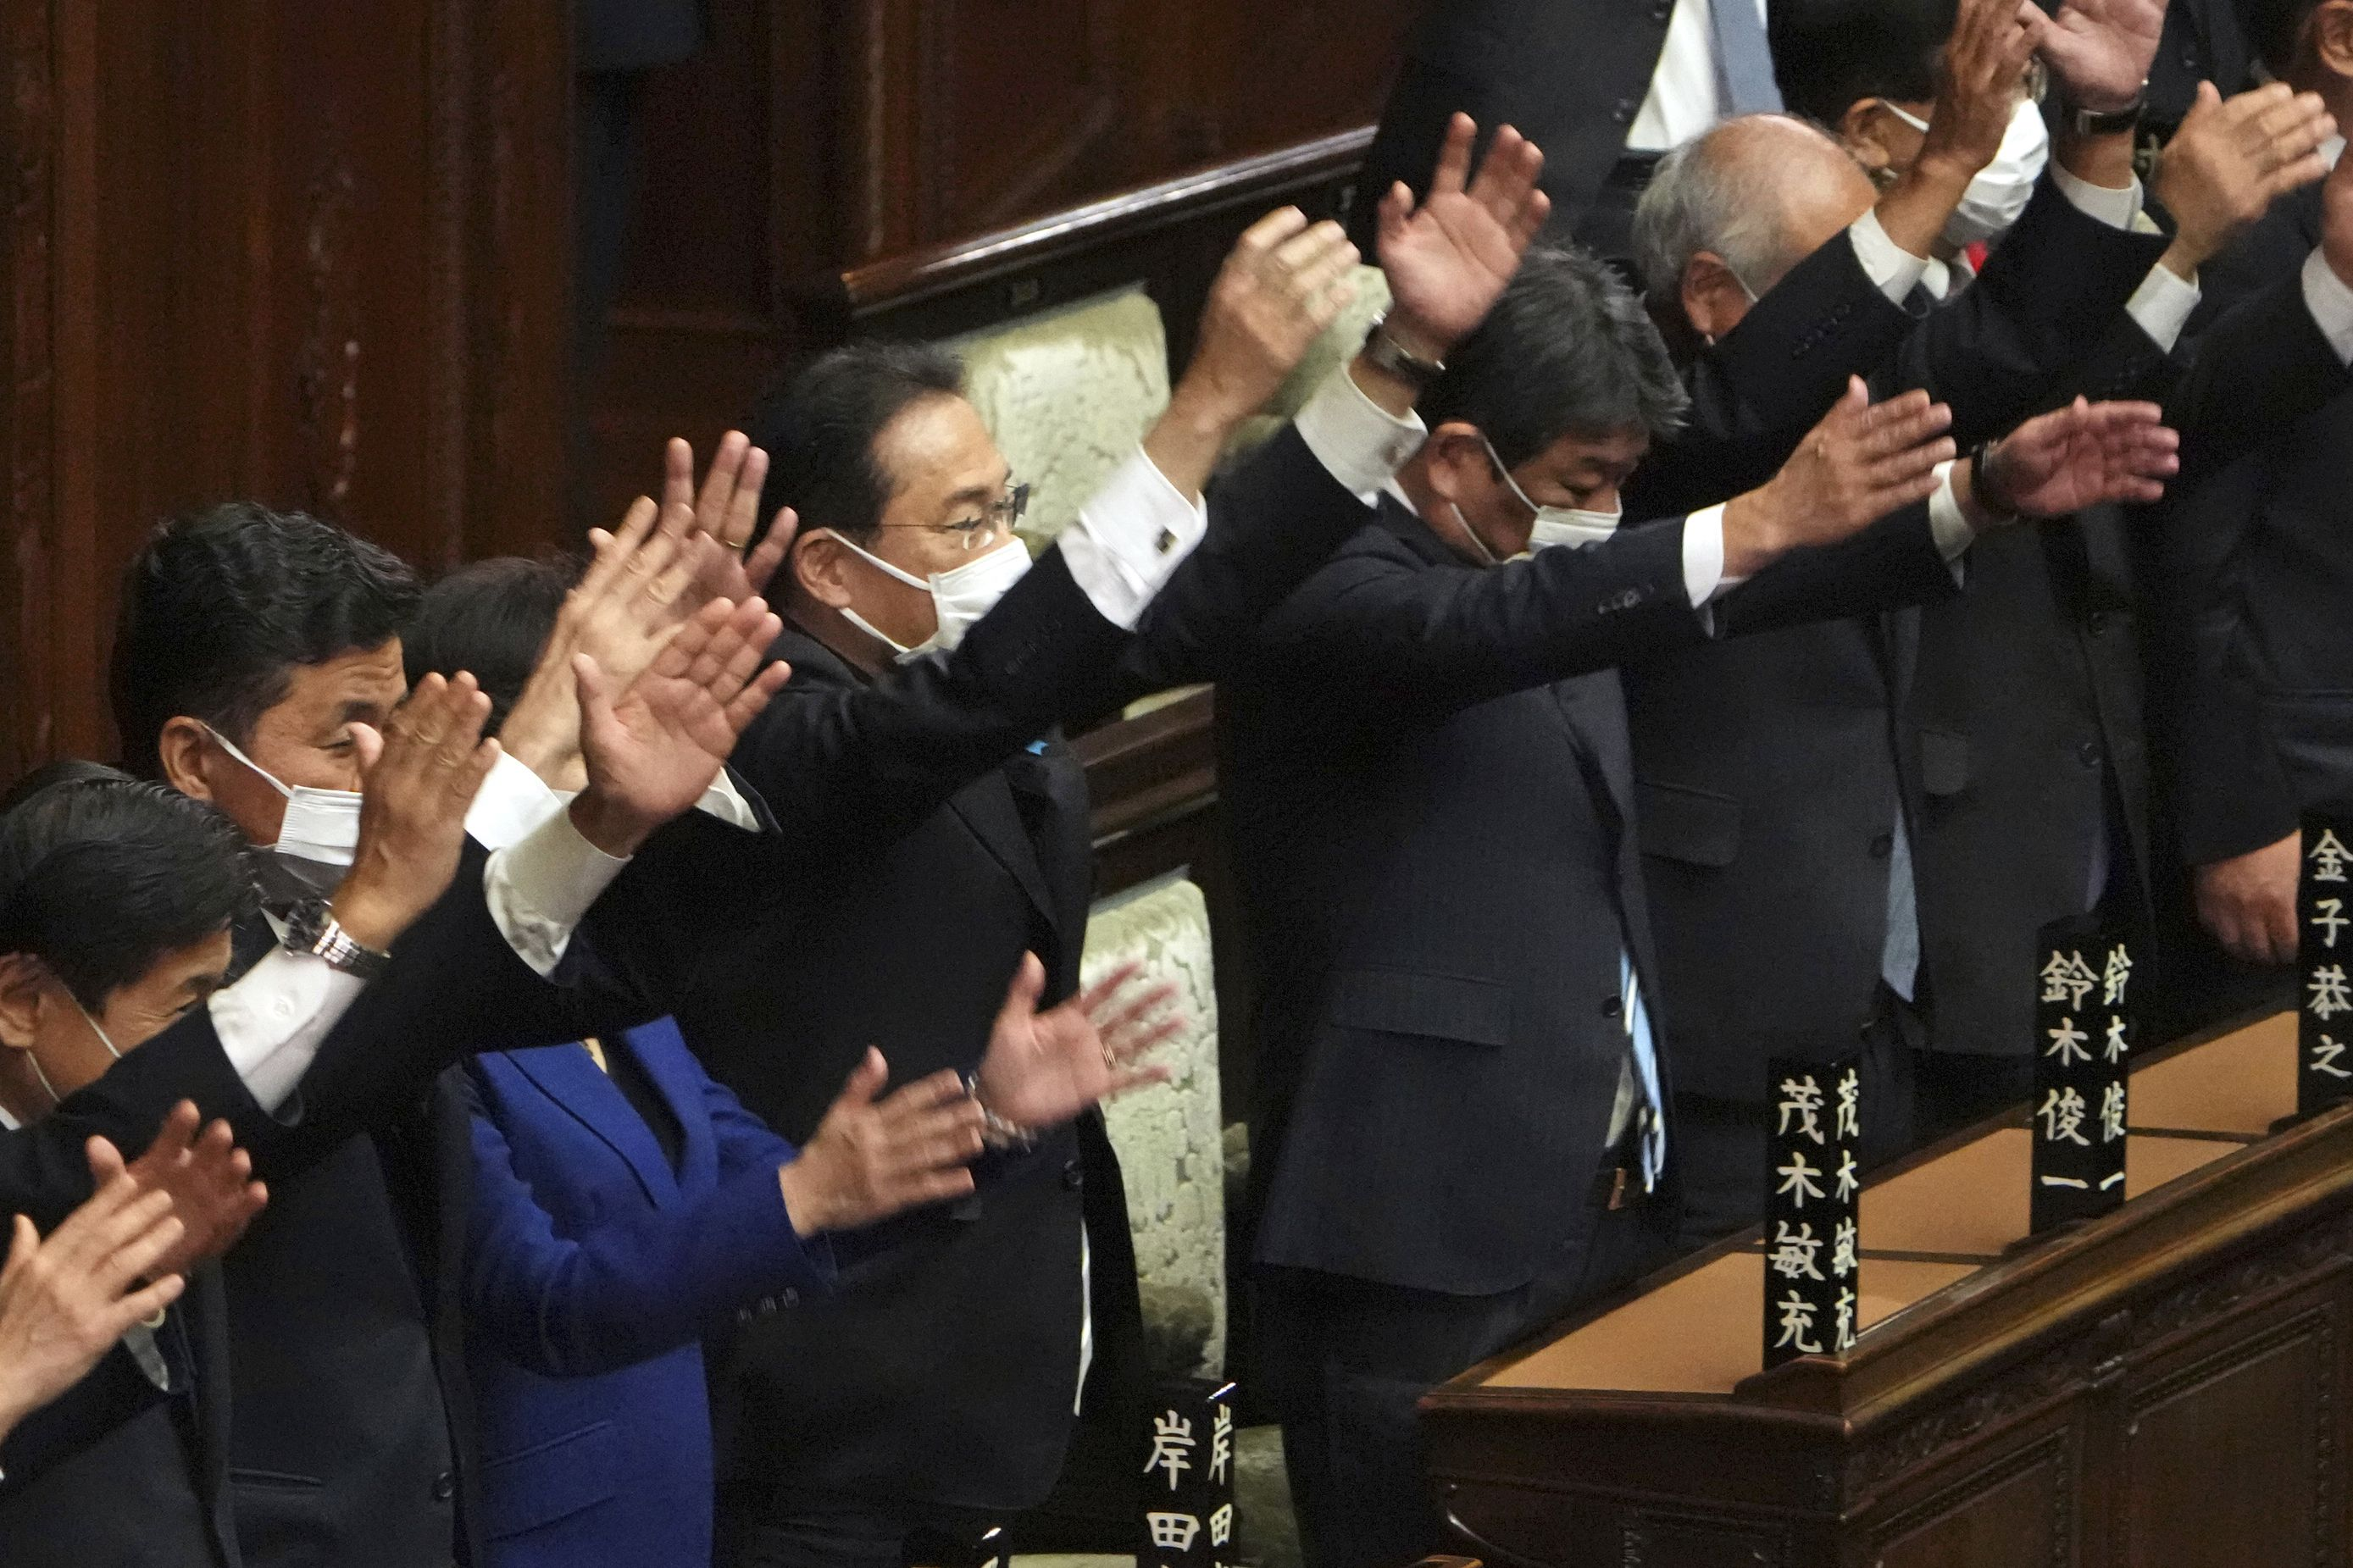 japon disuelve parlamento antes de voto de 31 de octubre